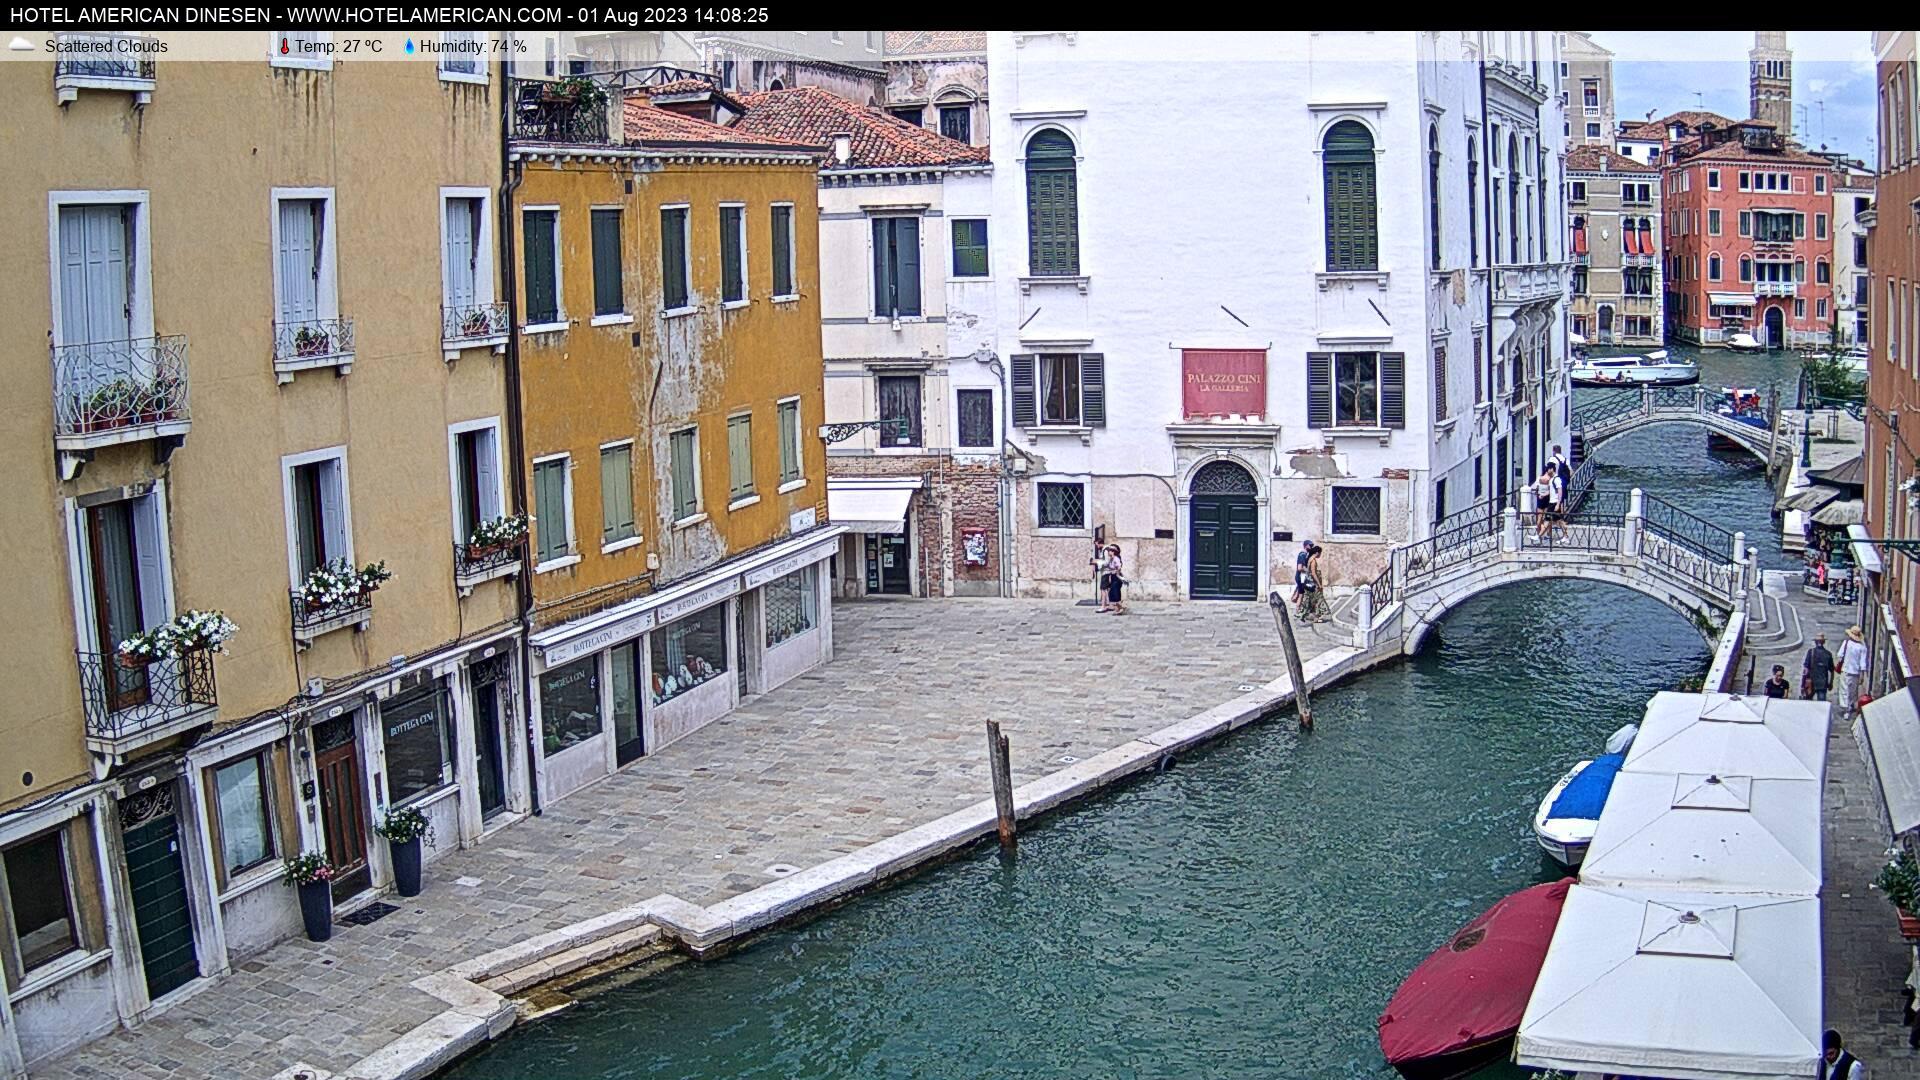 Venedig Sa. 14:08